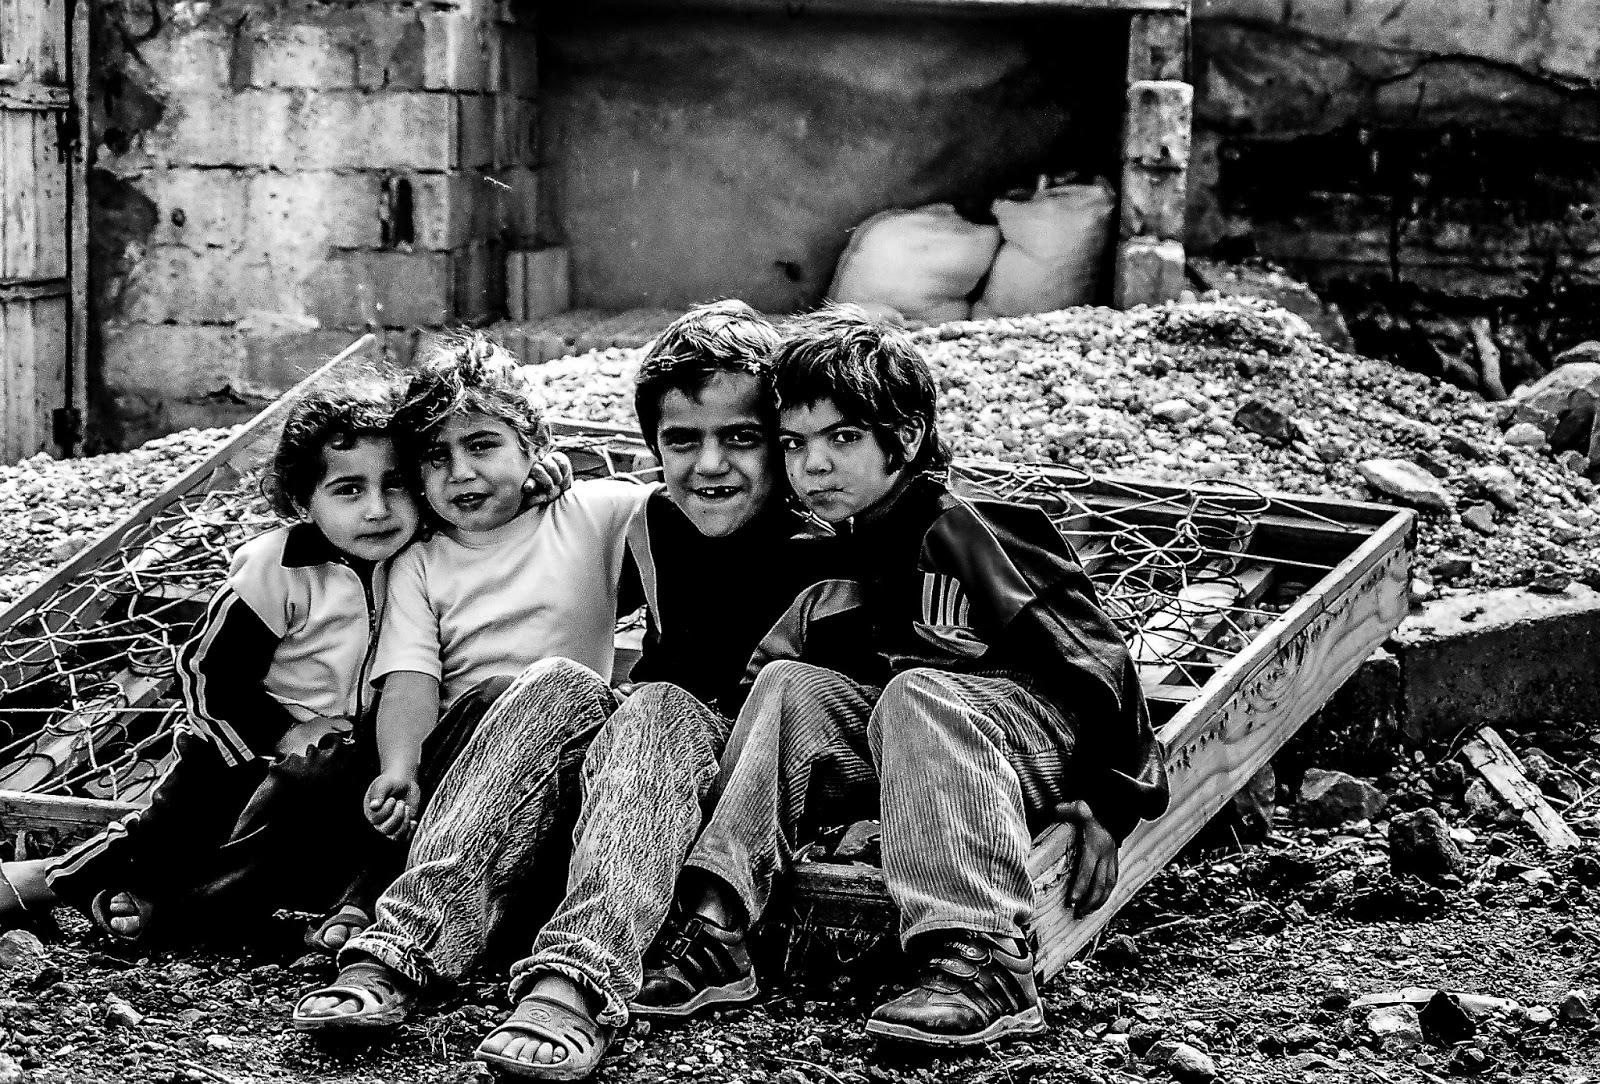 enfin syrien retrouver en turquie